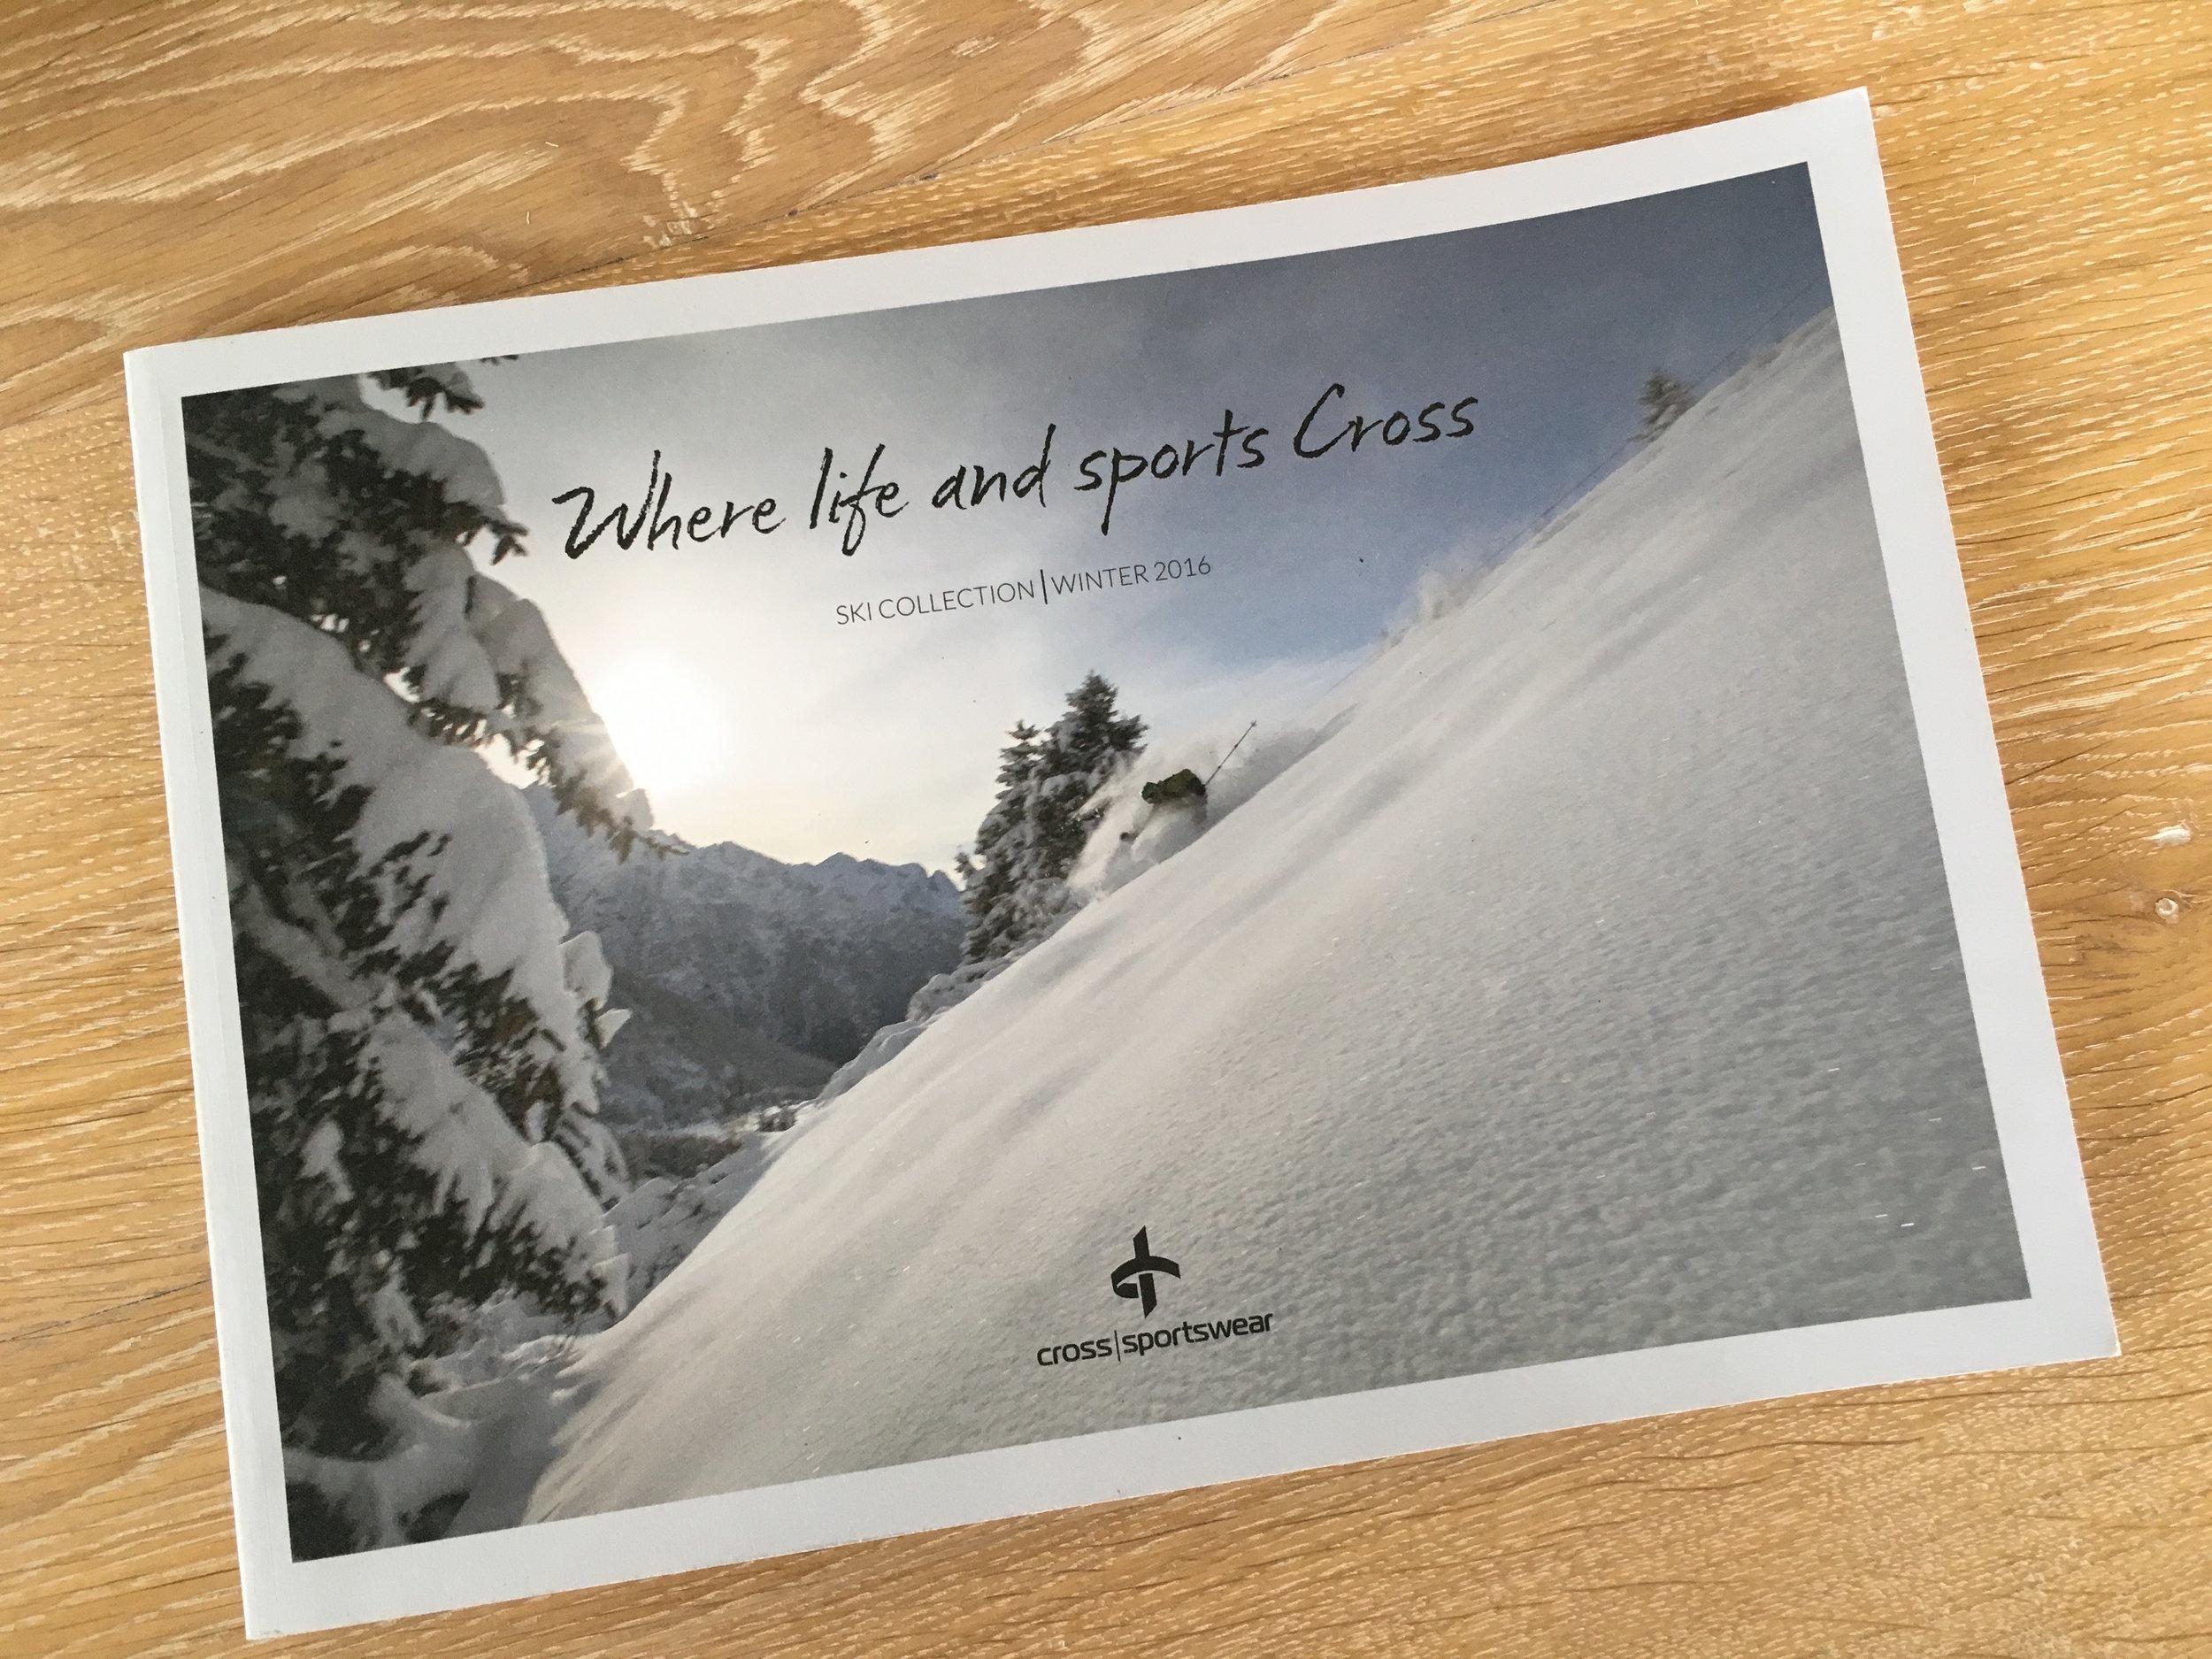 Cover, Cross Sportswear ski Collection, 2016